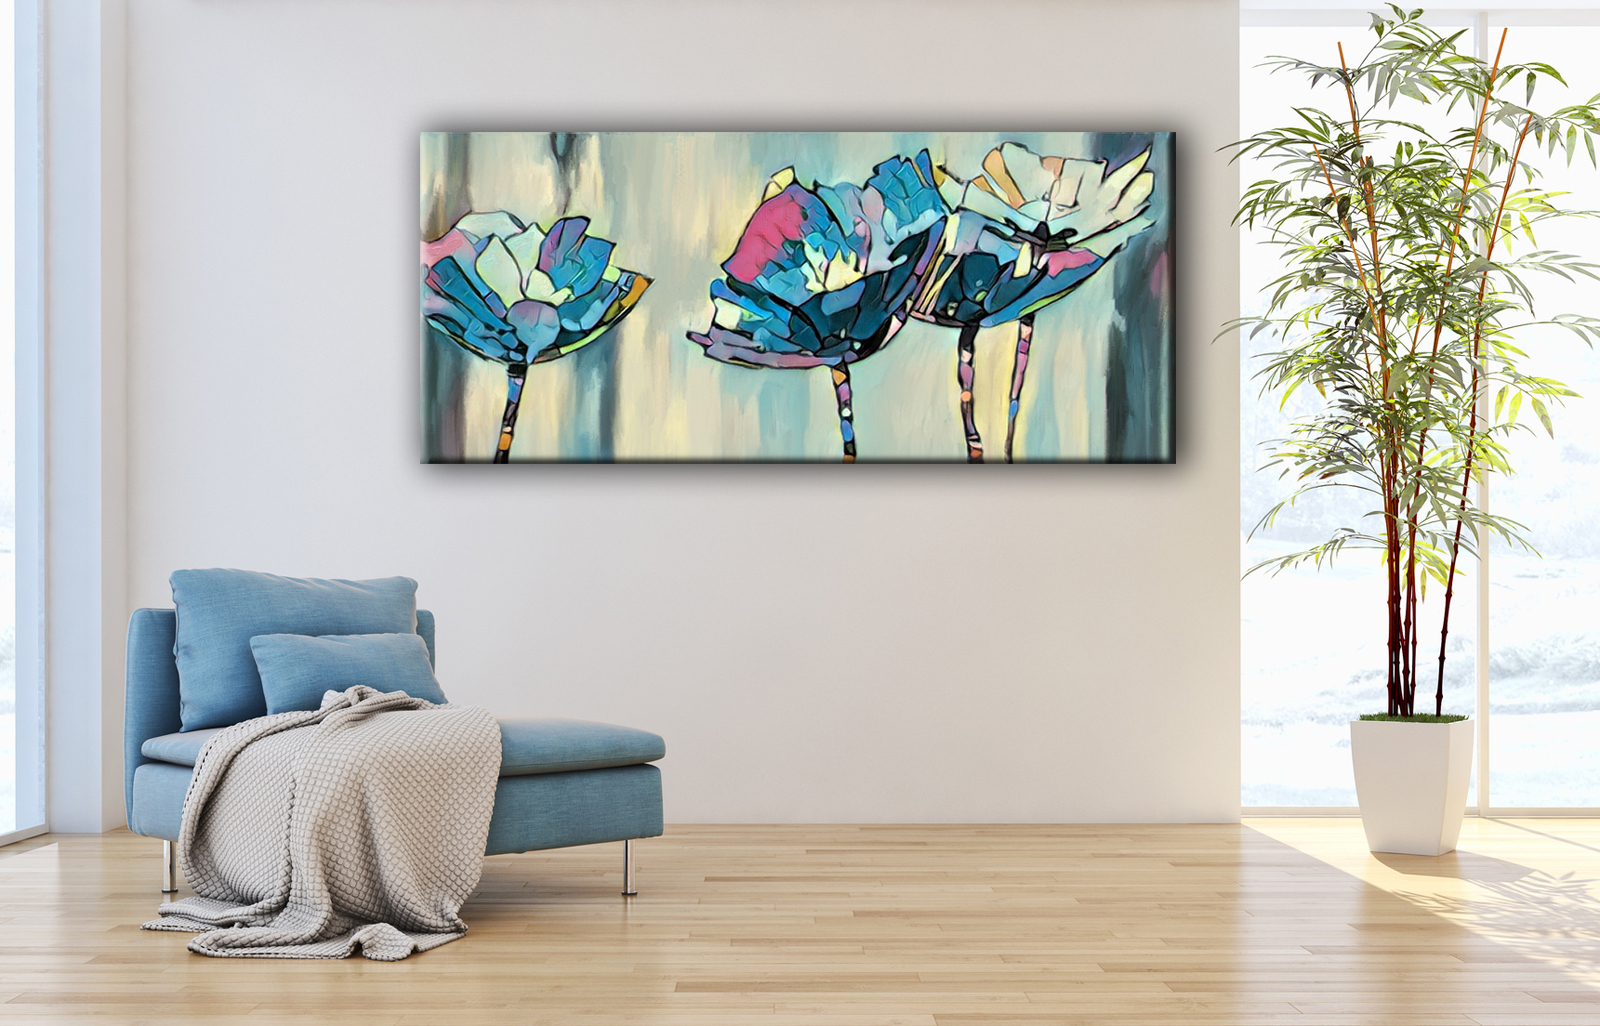 Cuadros modernos de flores color azul tiendas de cuadros splash - Cuadros juveniles modernos ...